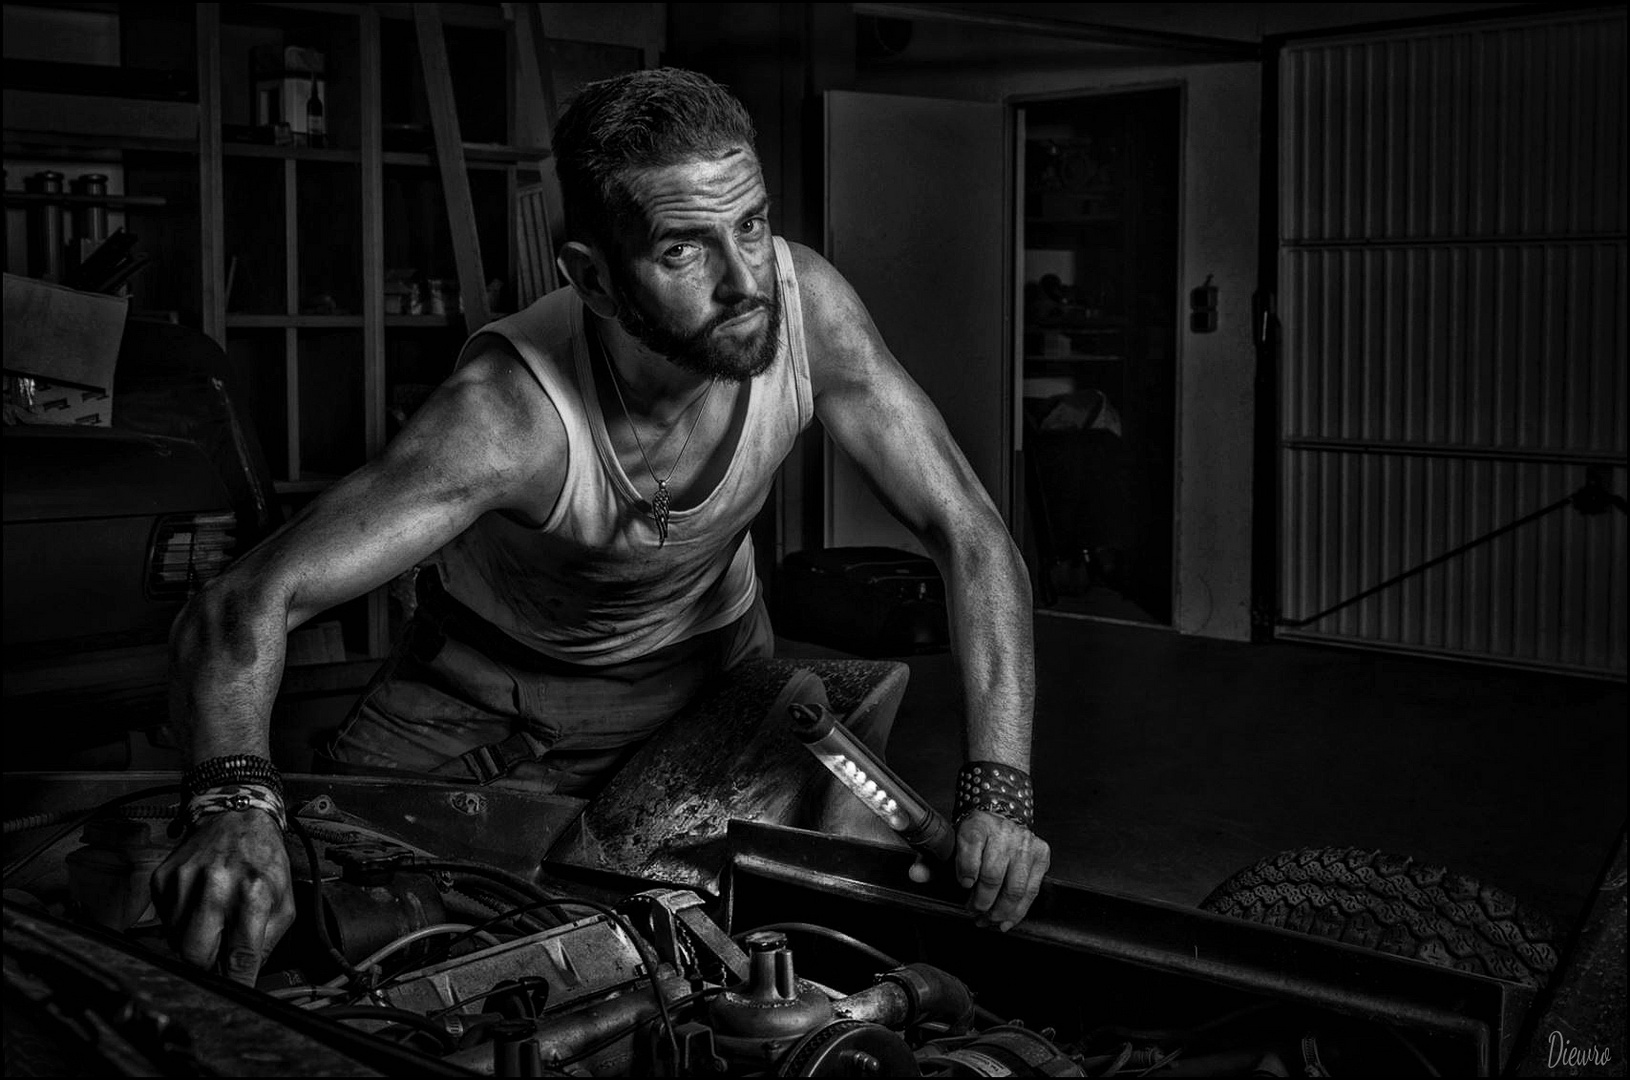 Car mechanic man